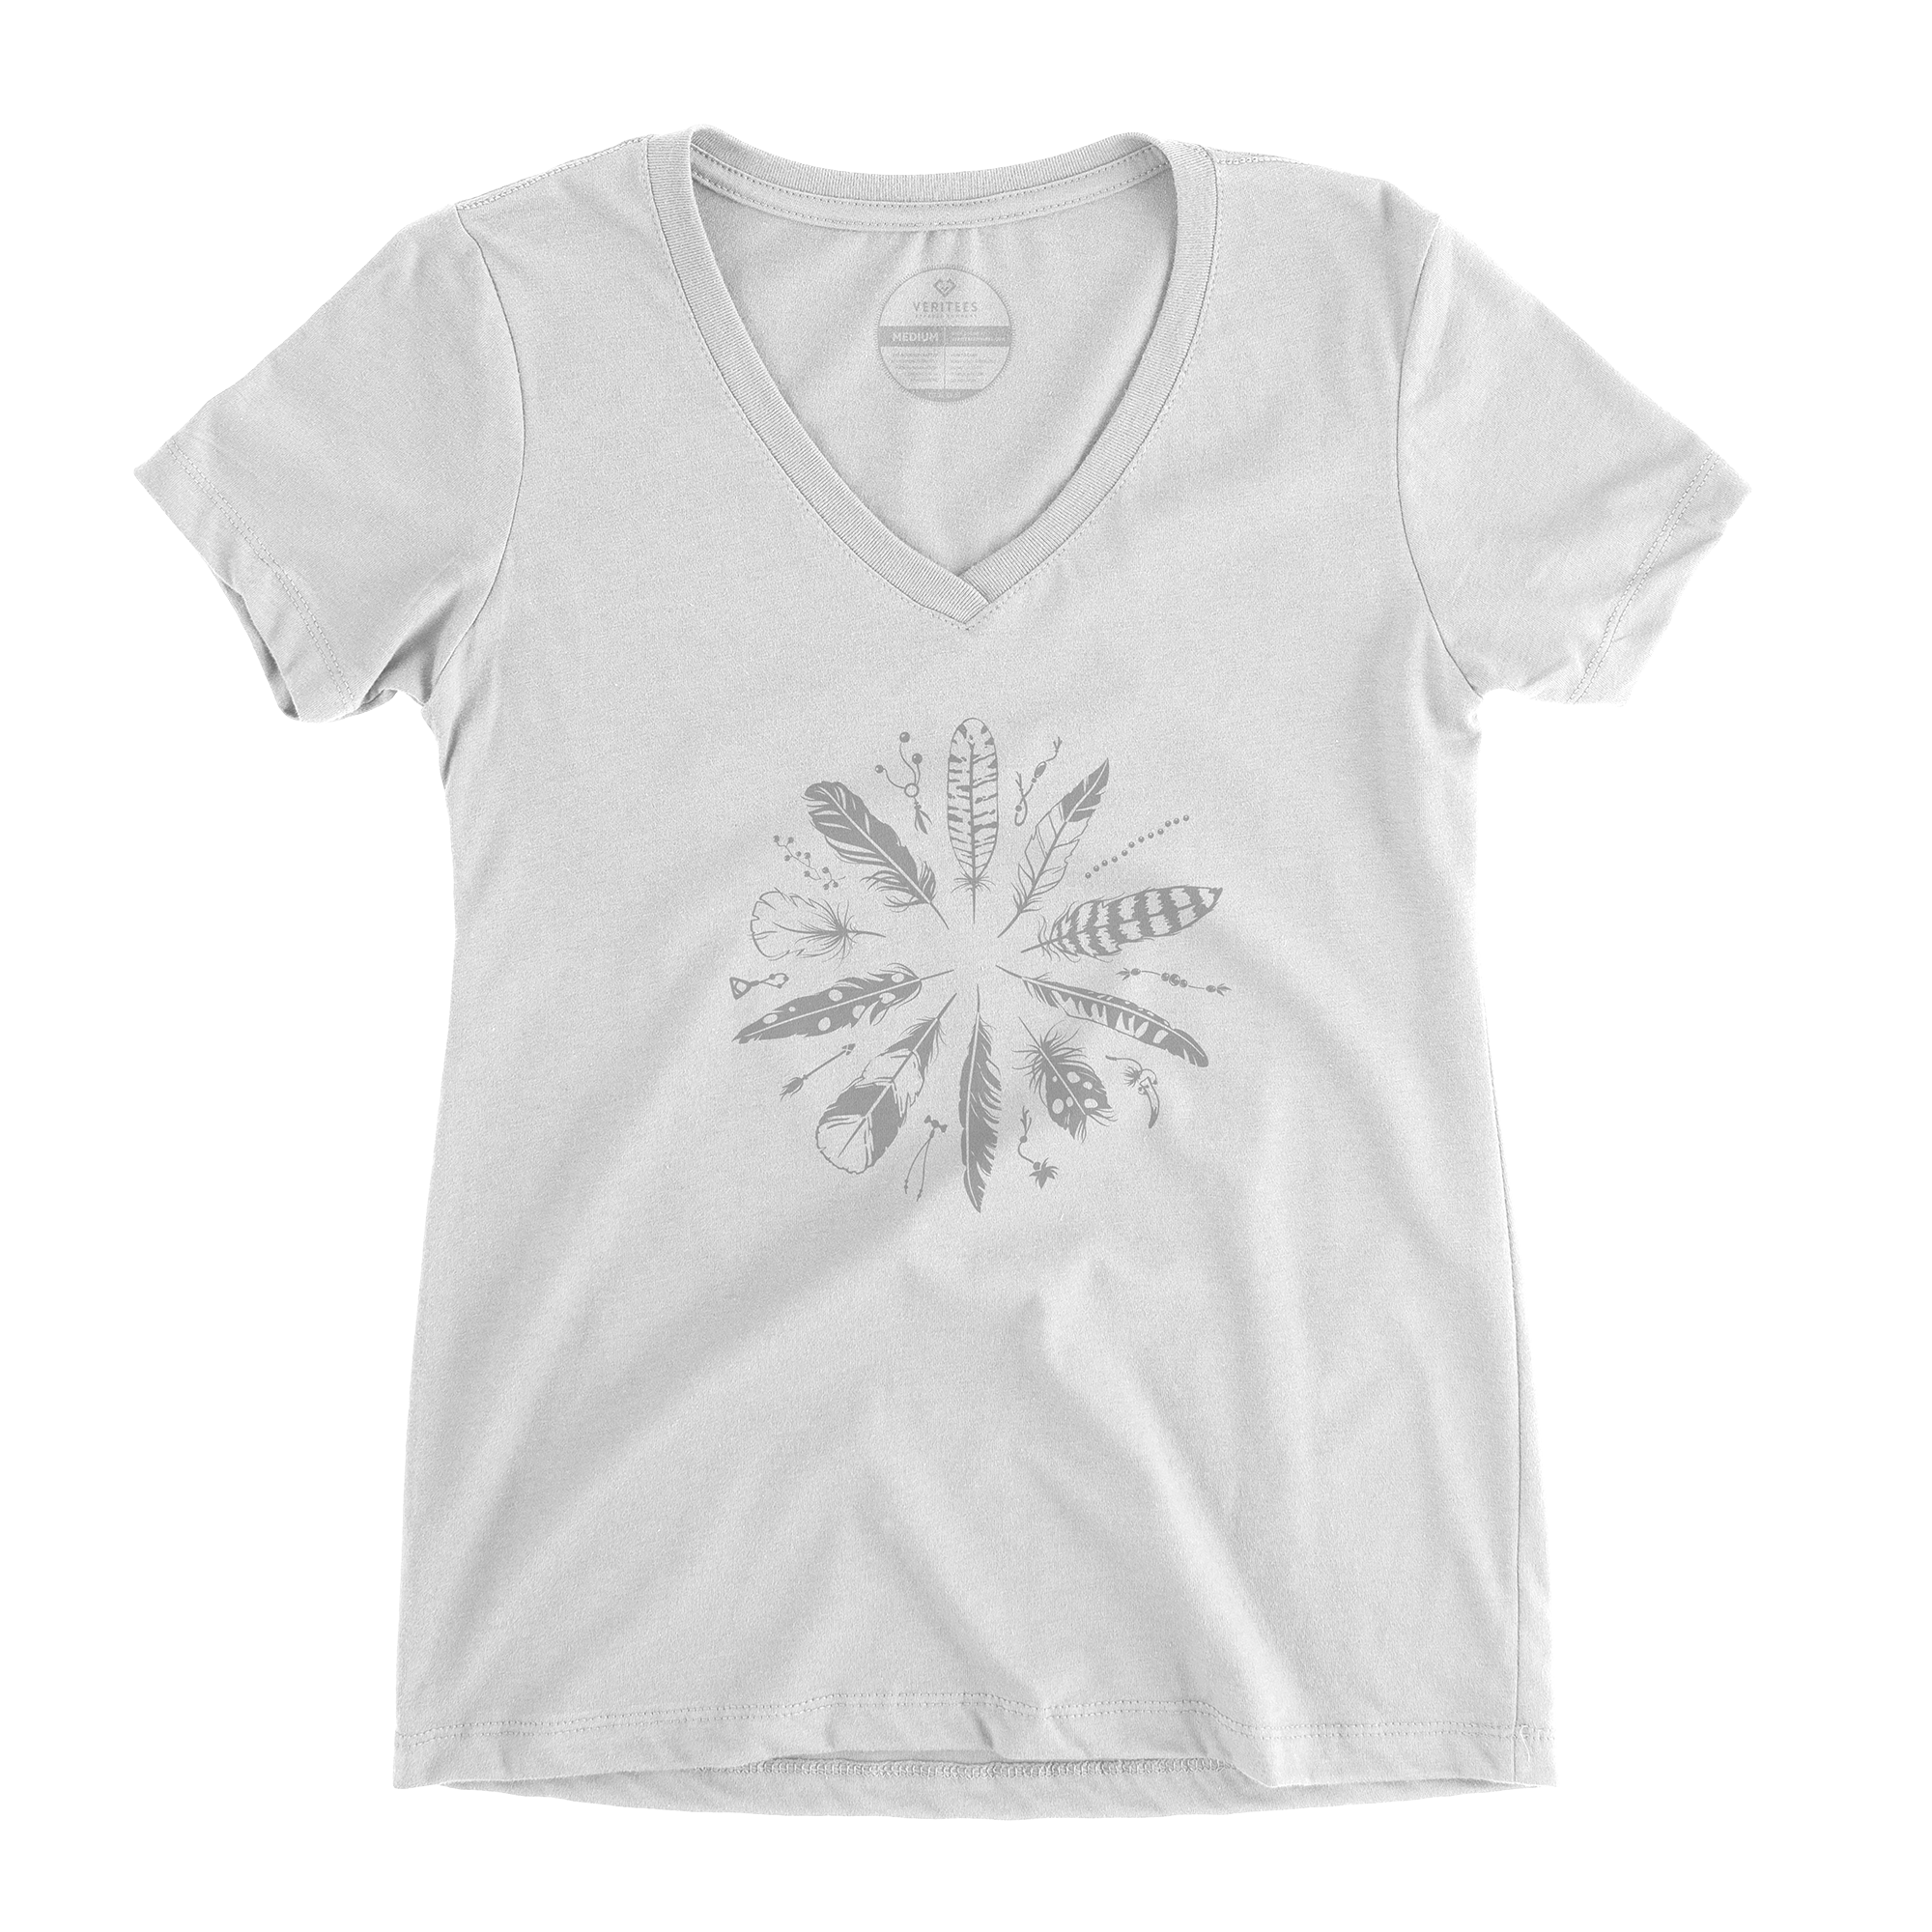 Medicine Shield V-Neck conspiracy t-shirt